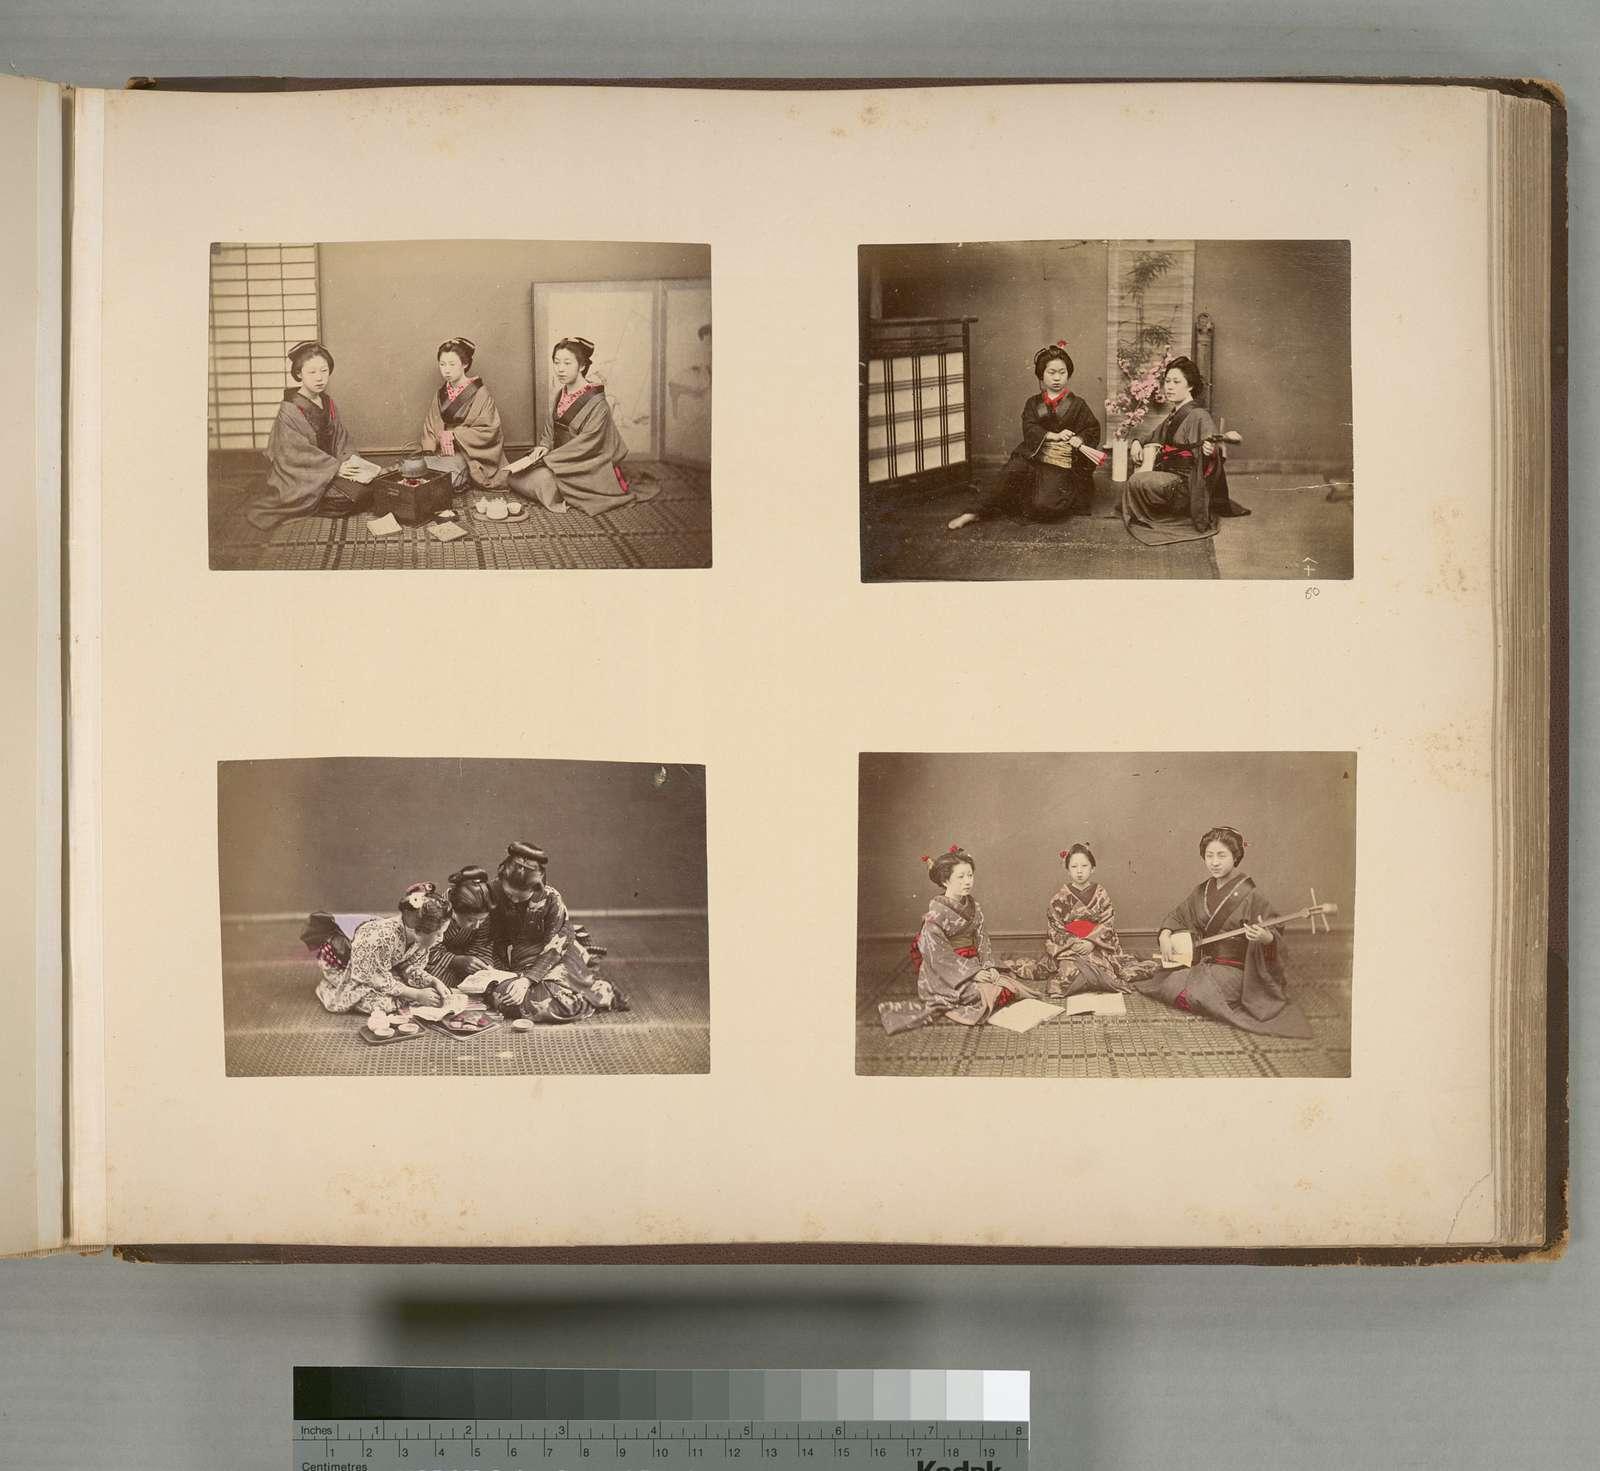 Japanese Women : Accomplishments (Music), Tea break  and Chatting